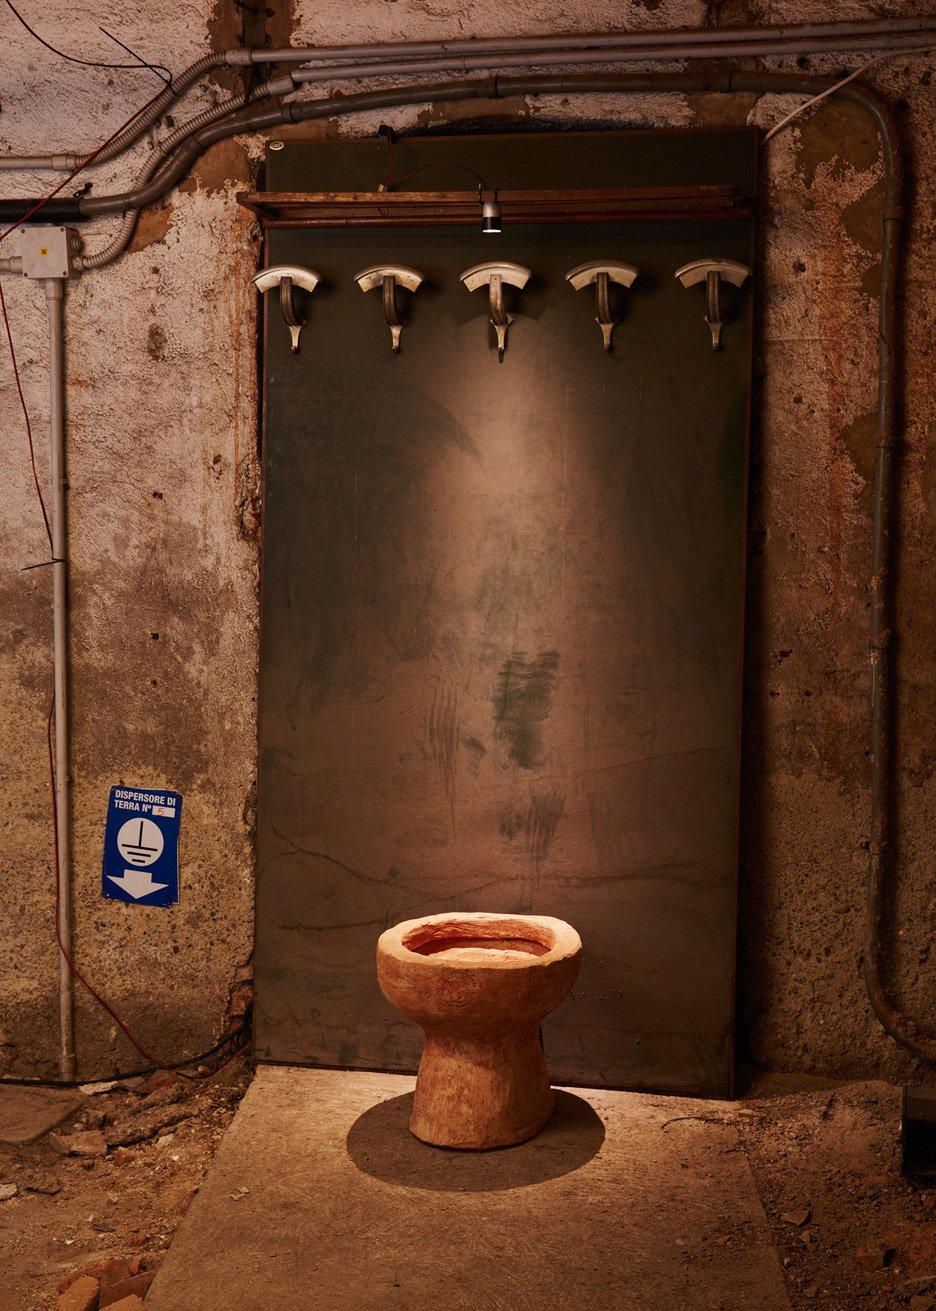 shit-museum-museo-della-merda-massimo-torrigiani-primordial-products-design-exhibition-milan-2016-henrik-blomqvist_dezeen_936_22